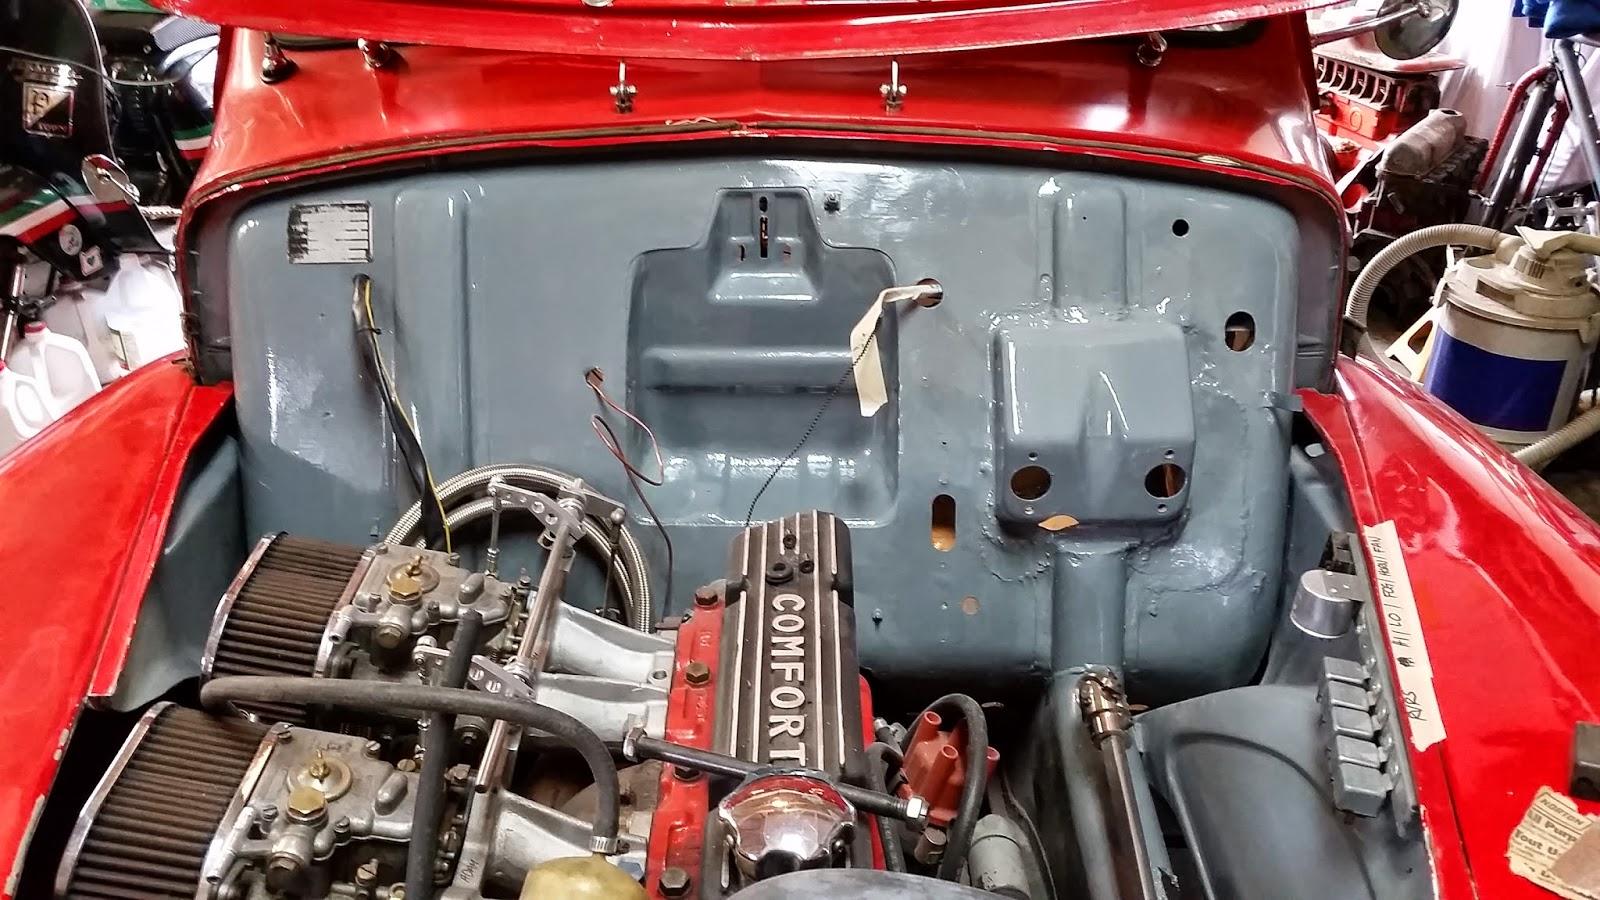 SwedishRelics - Vintage Volvo Voodoo: Carburetors